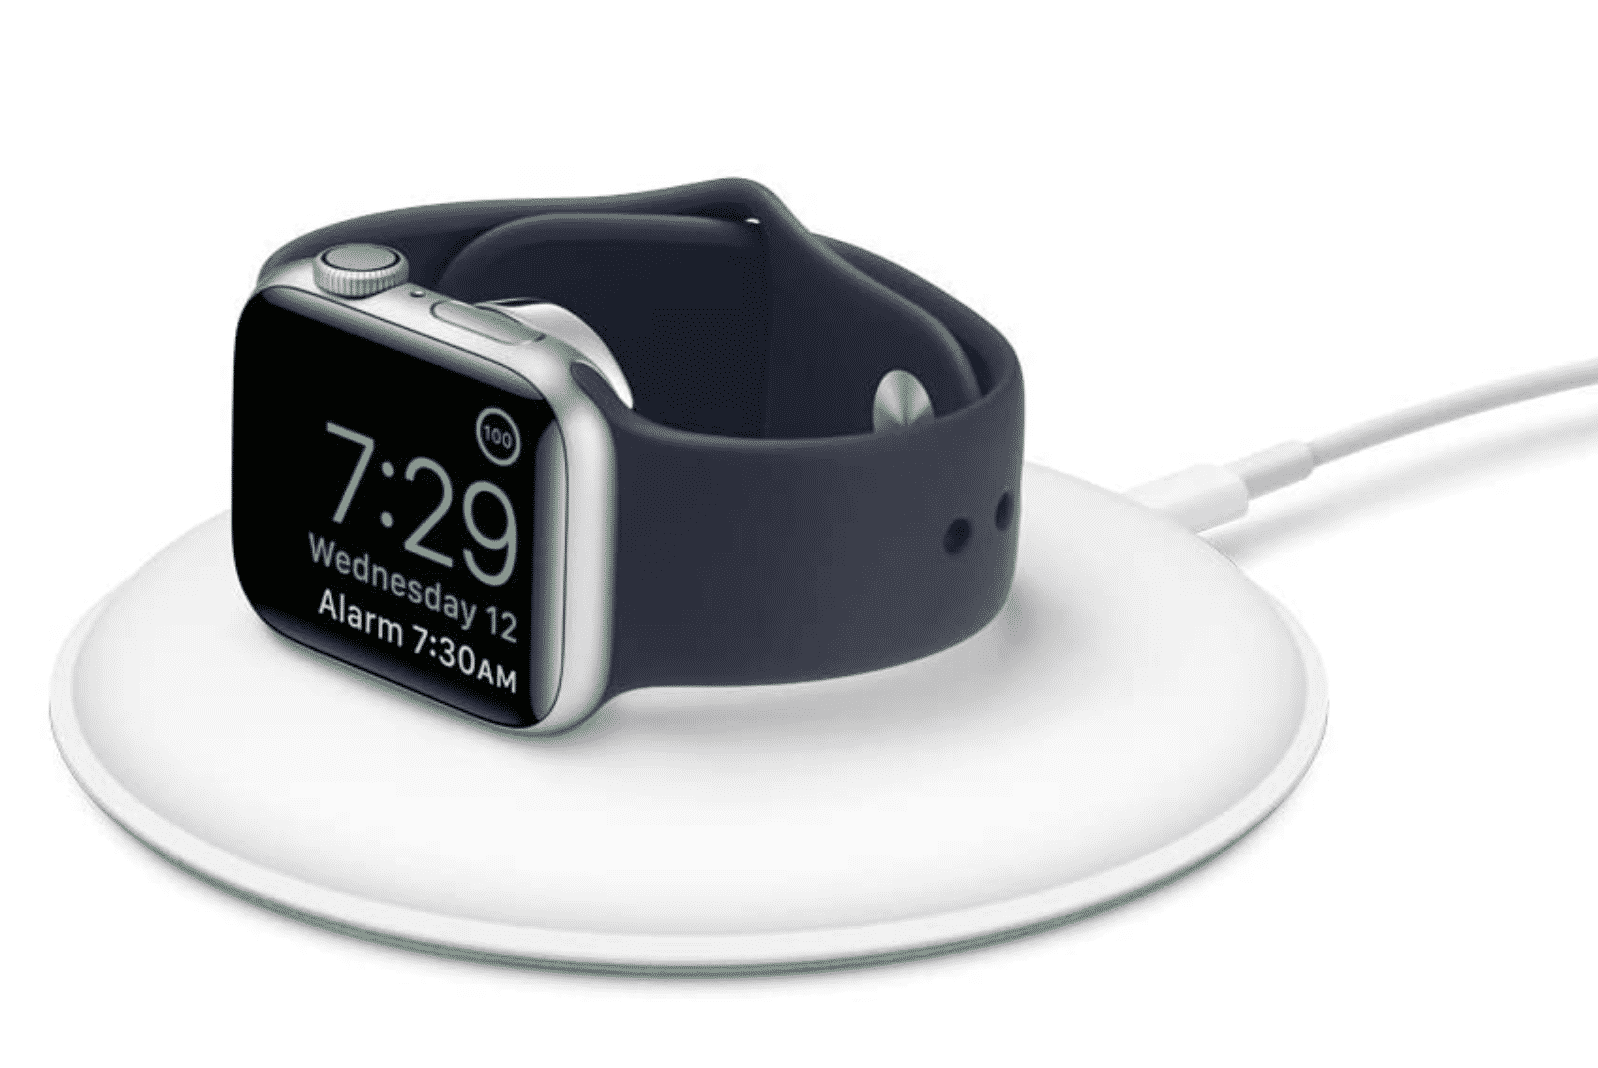 Apple Watch Series 7 Magnetic Dock